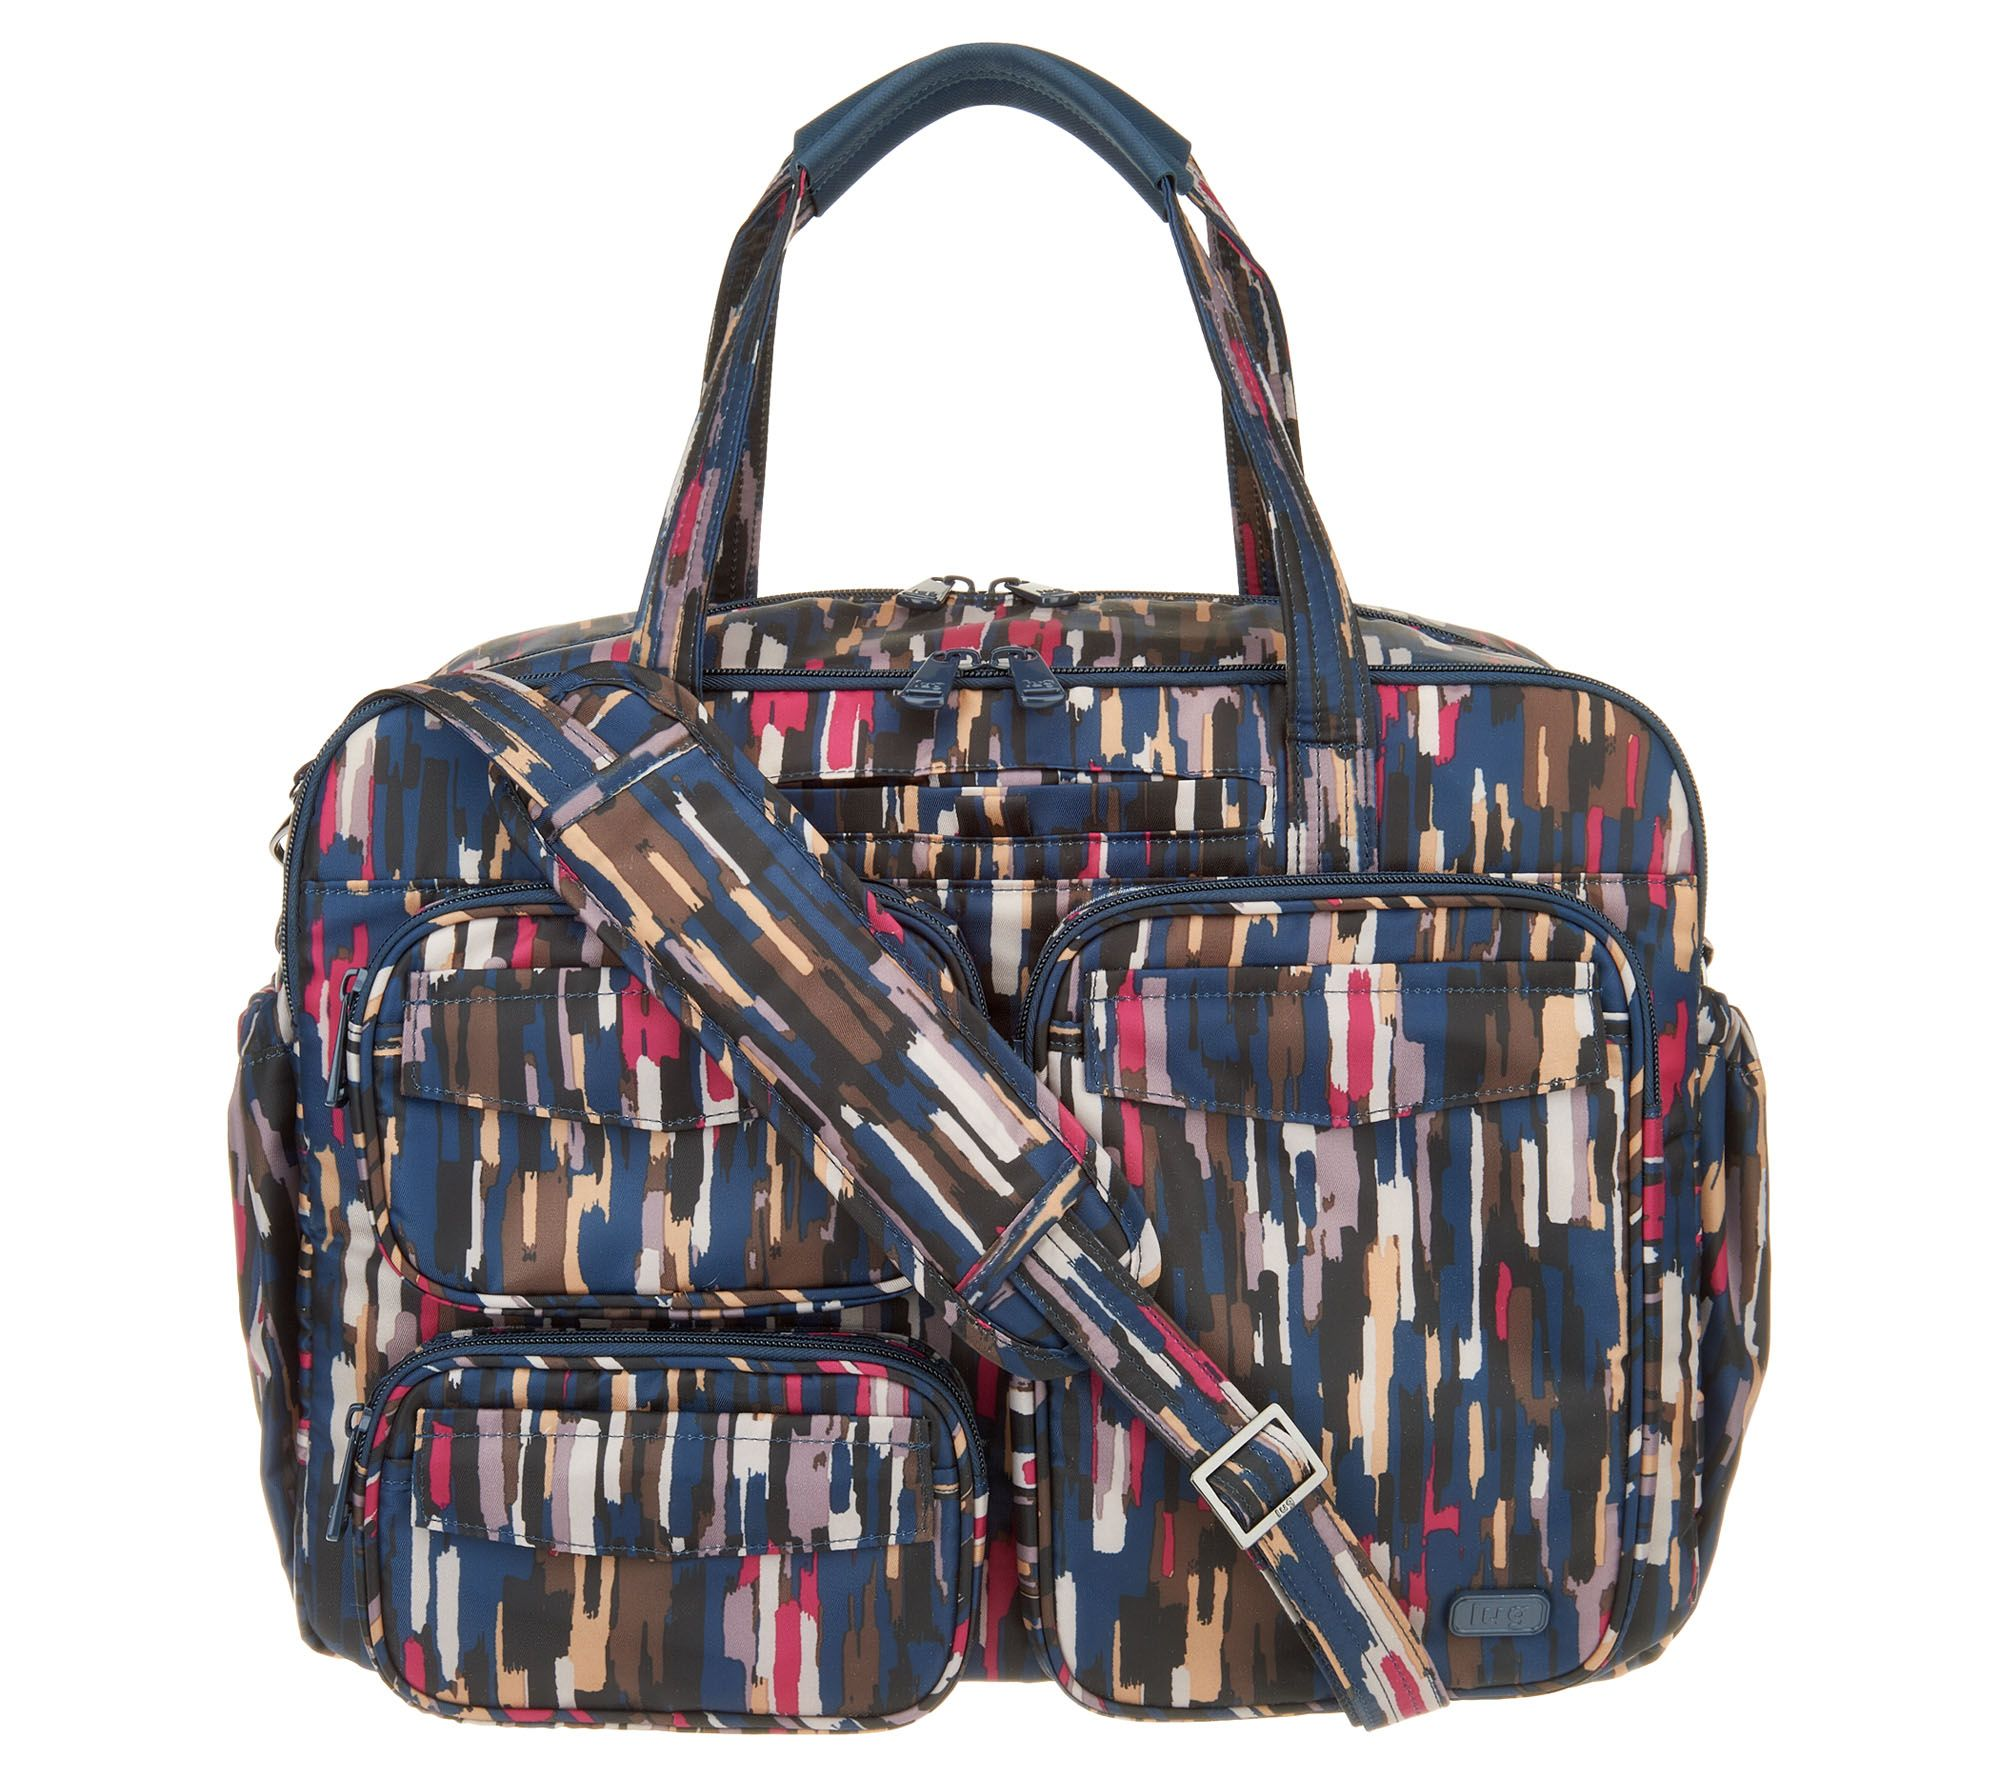 7a5acd158 Lug East/West Puddle Jumper Duffel Bag - Page 1 — QVC.com